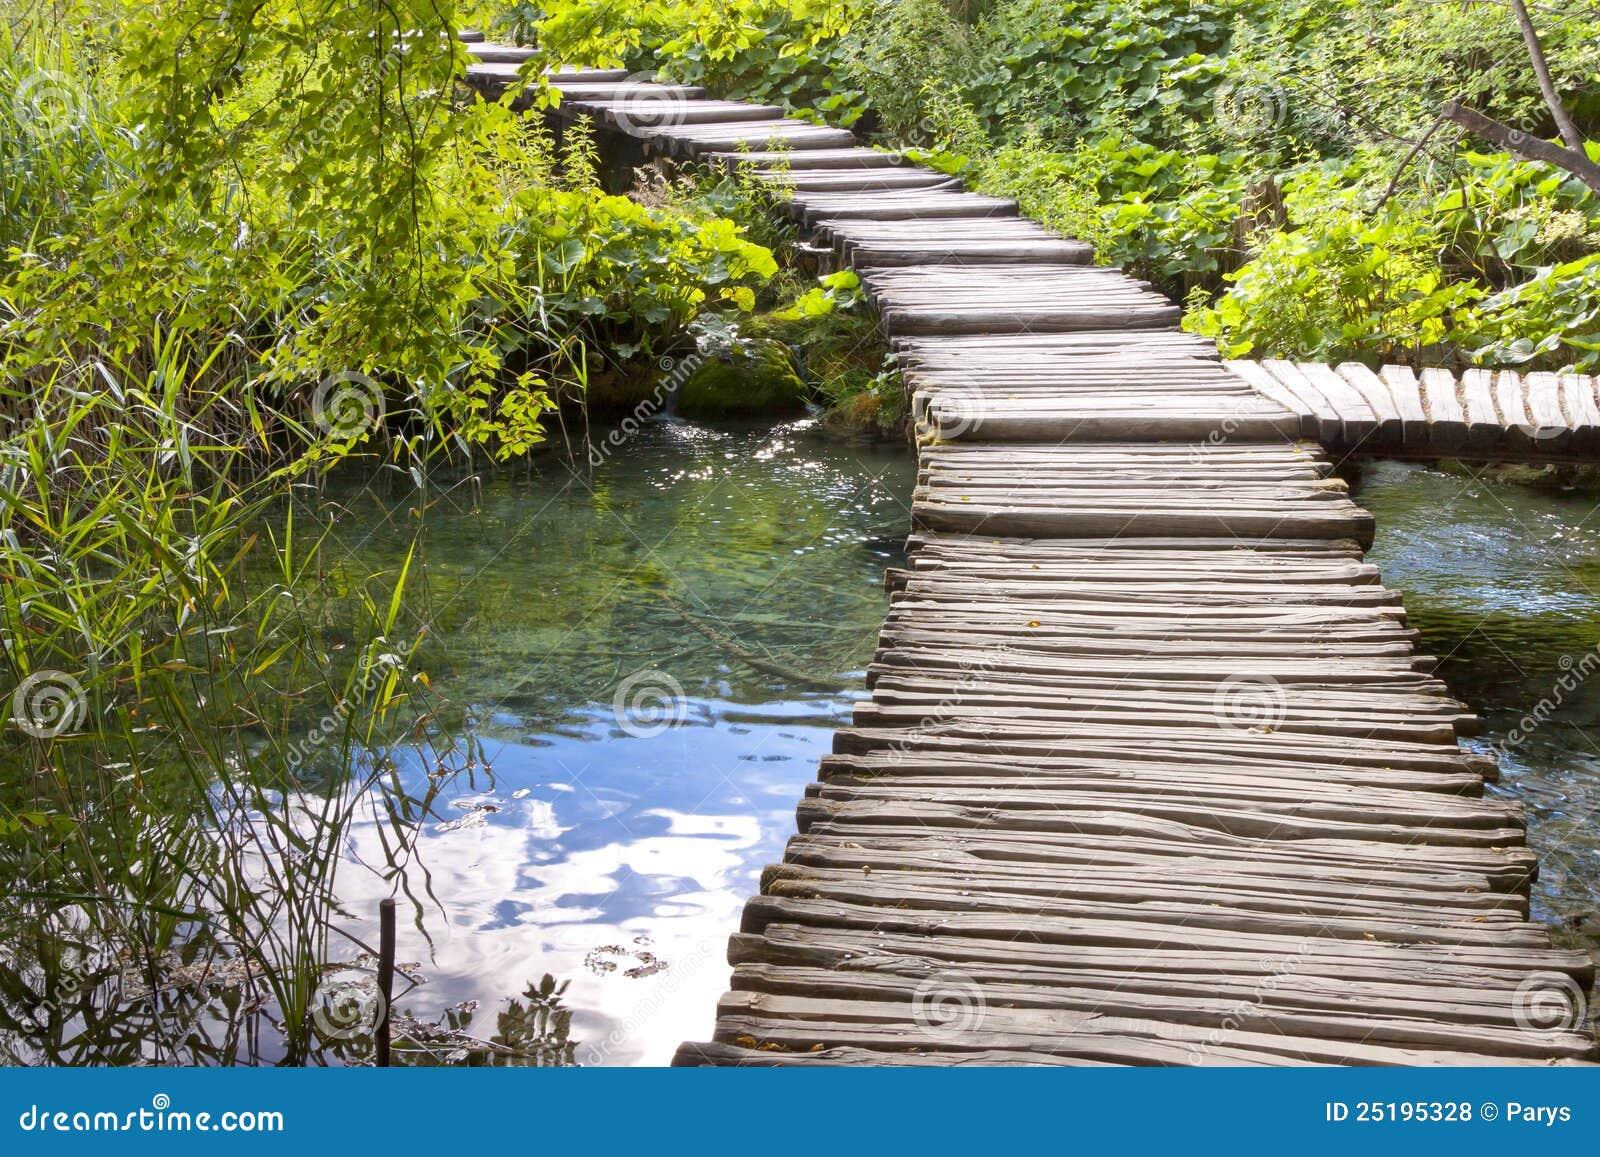 wooden pathway plitvice lakes croatia royalty free